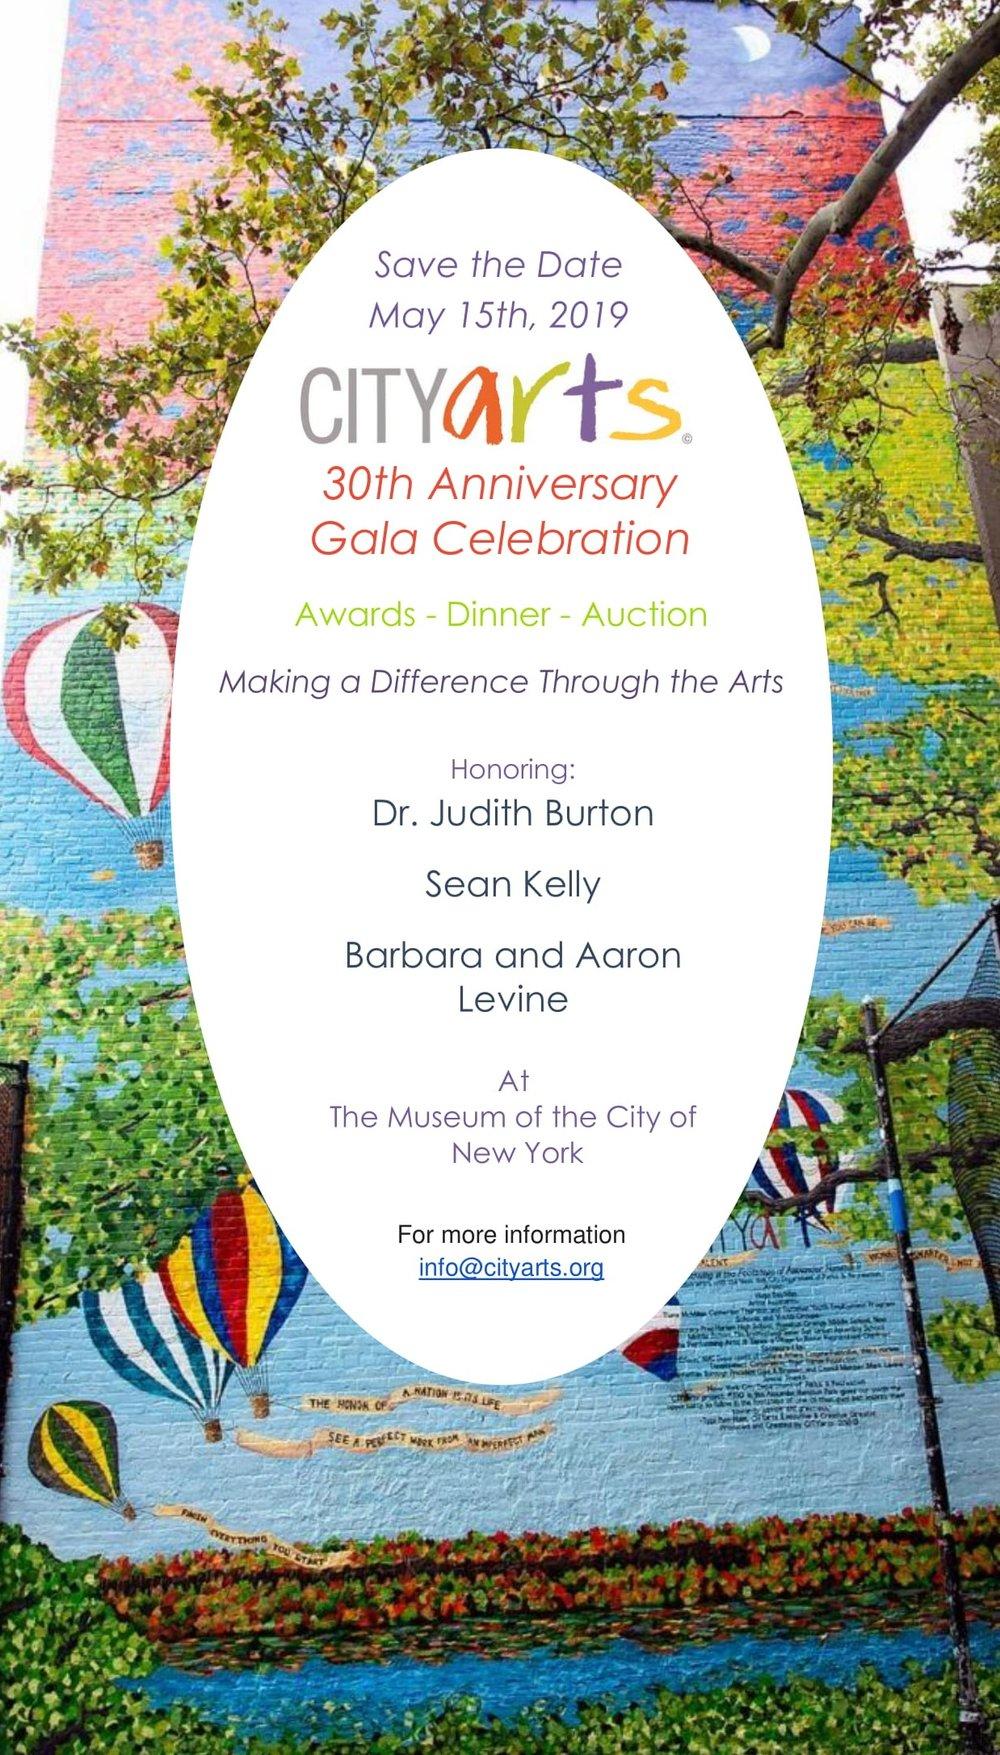 CITYarts+30th+Anniversary+Gala+Celebration-1.jpg